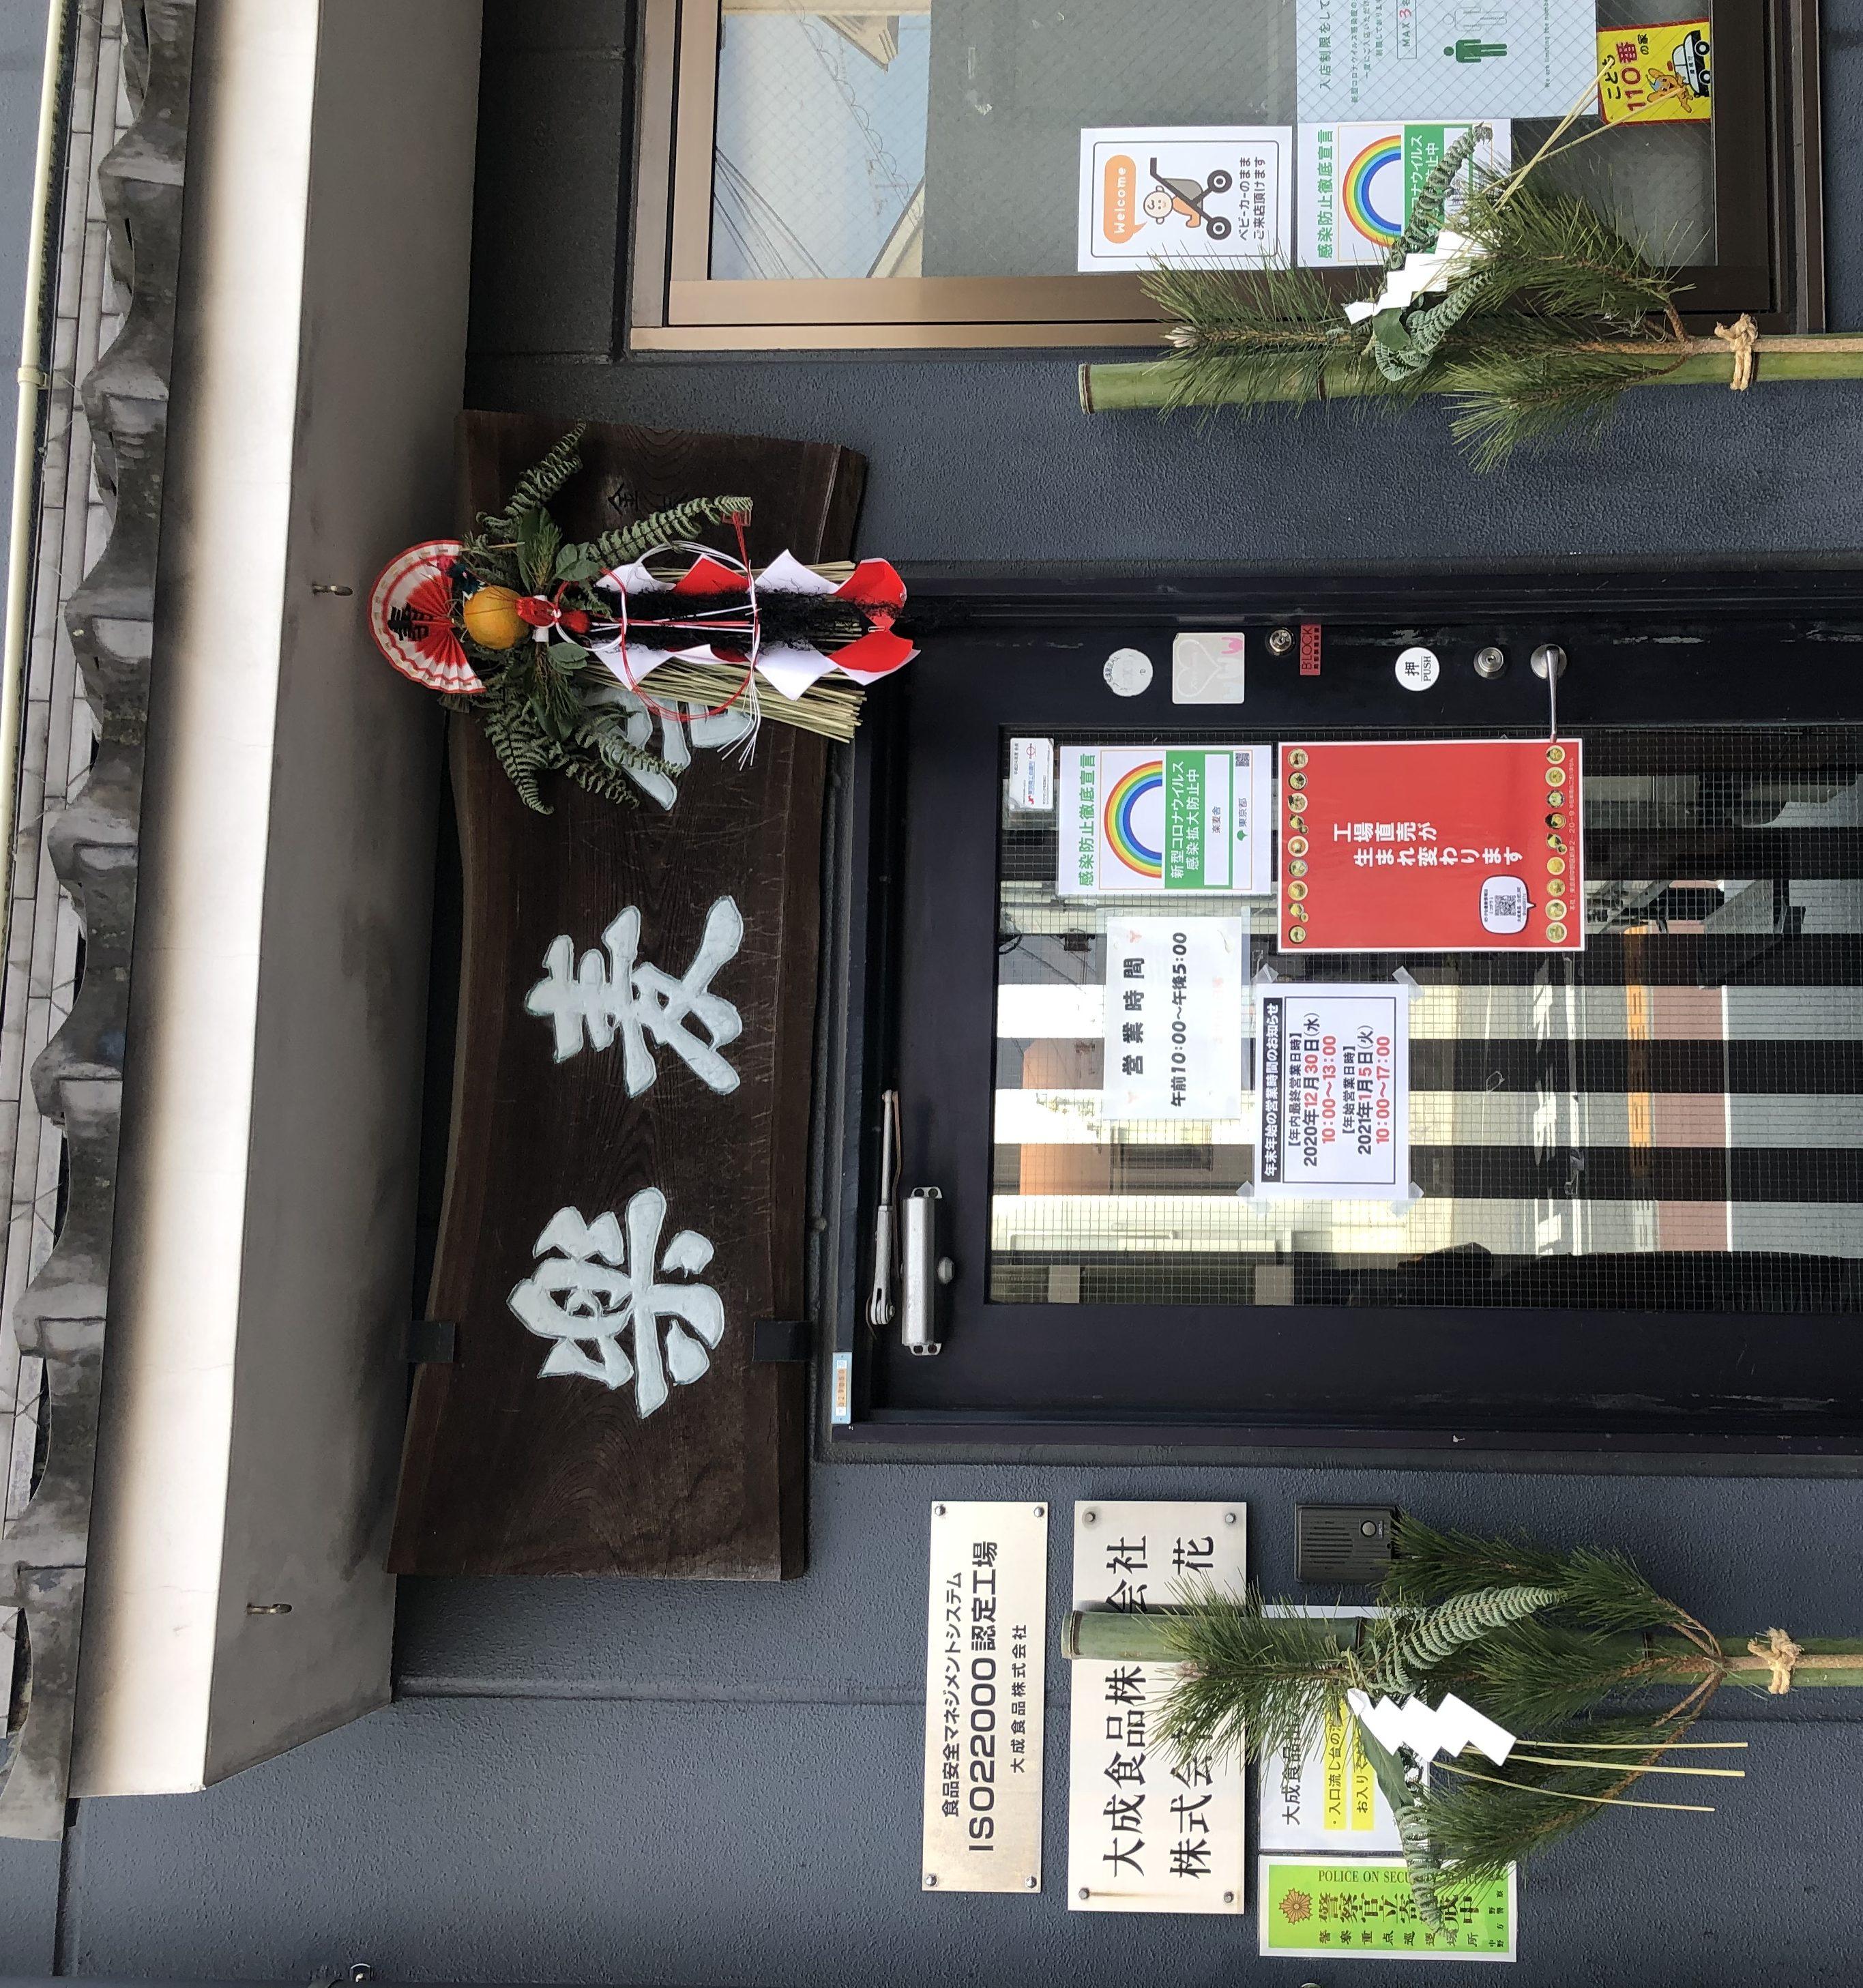 <謹賀新年>直販店、直営店の年始営業案内<麺彩房、上海麺館は1月5日から通常営業